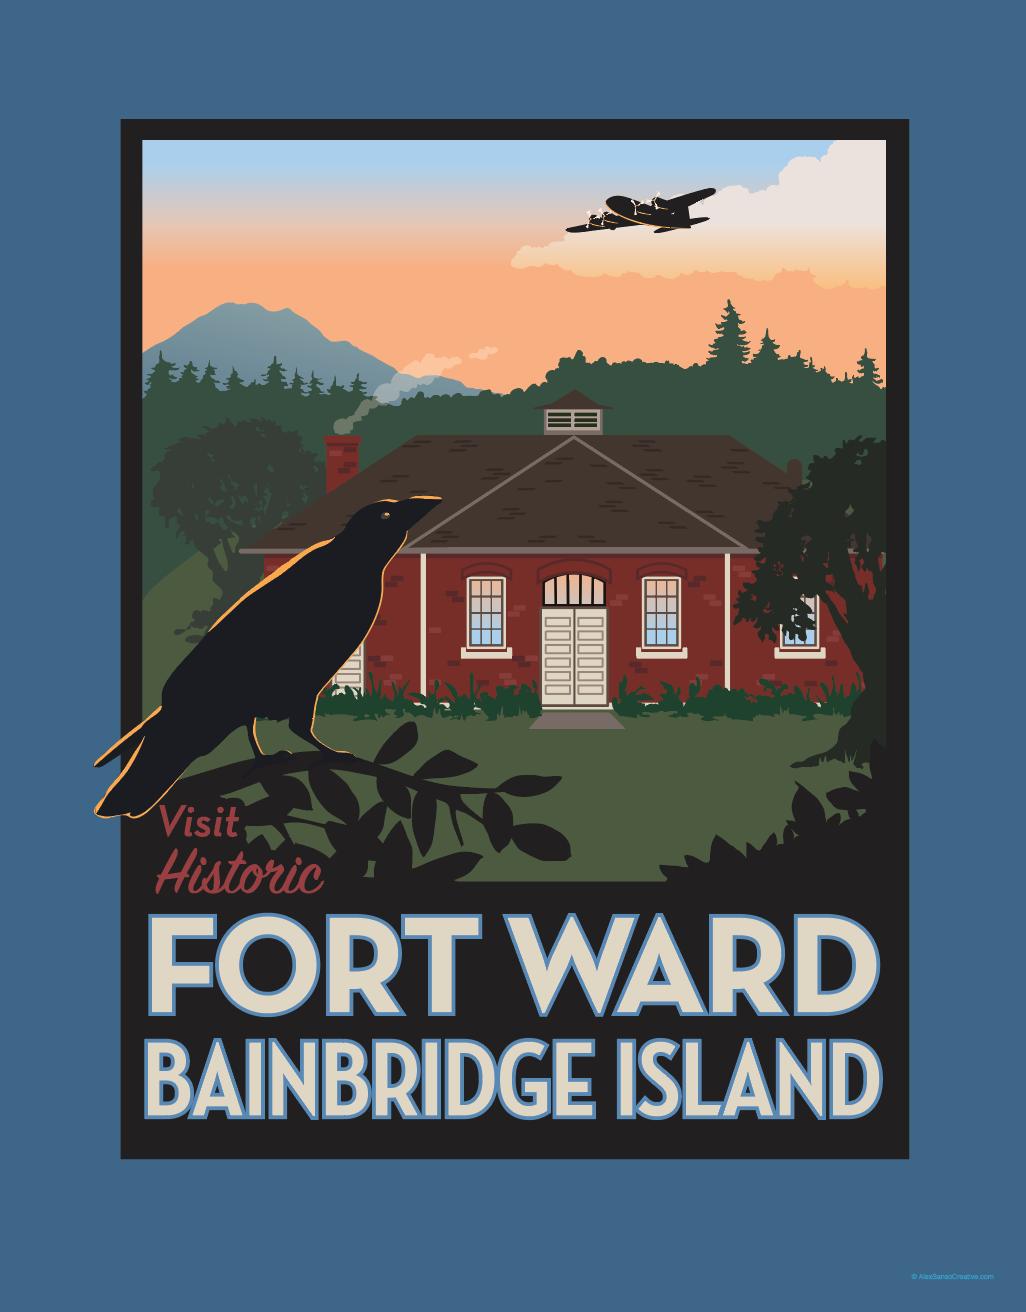 Historic Fort Ward